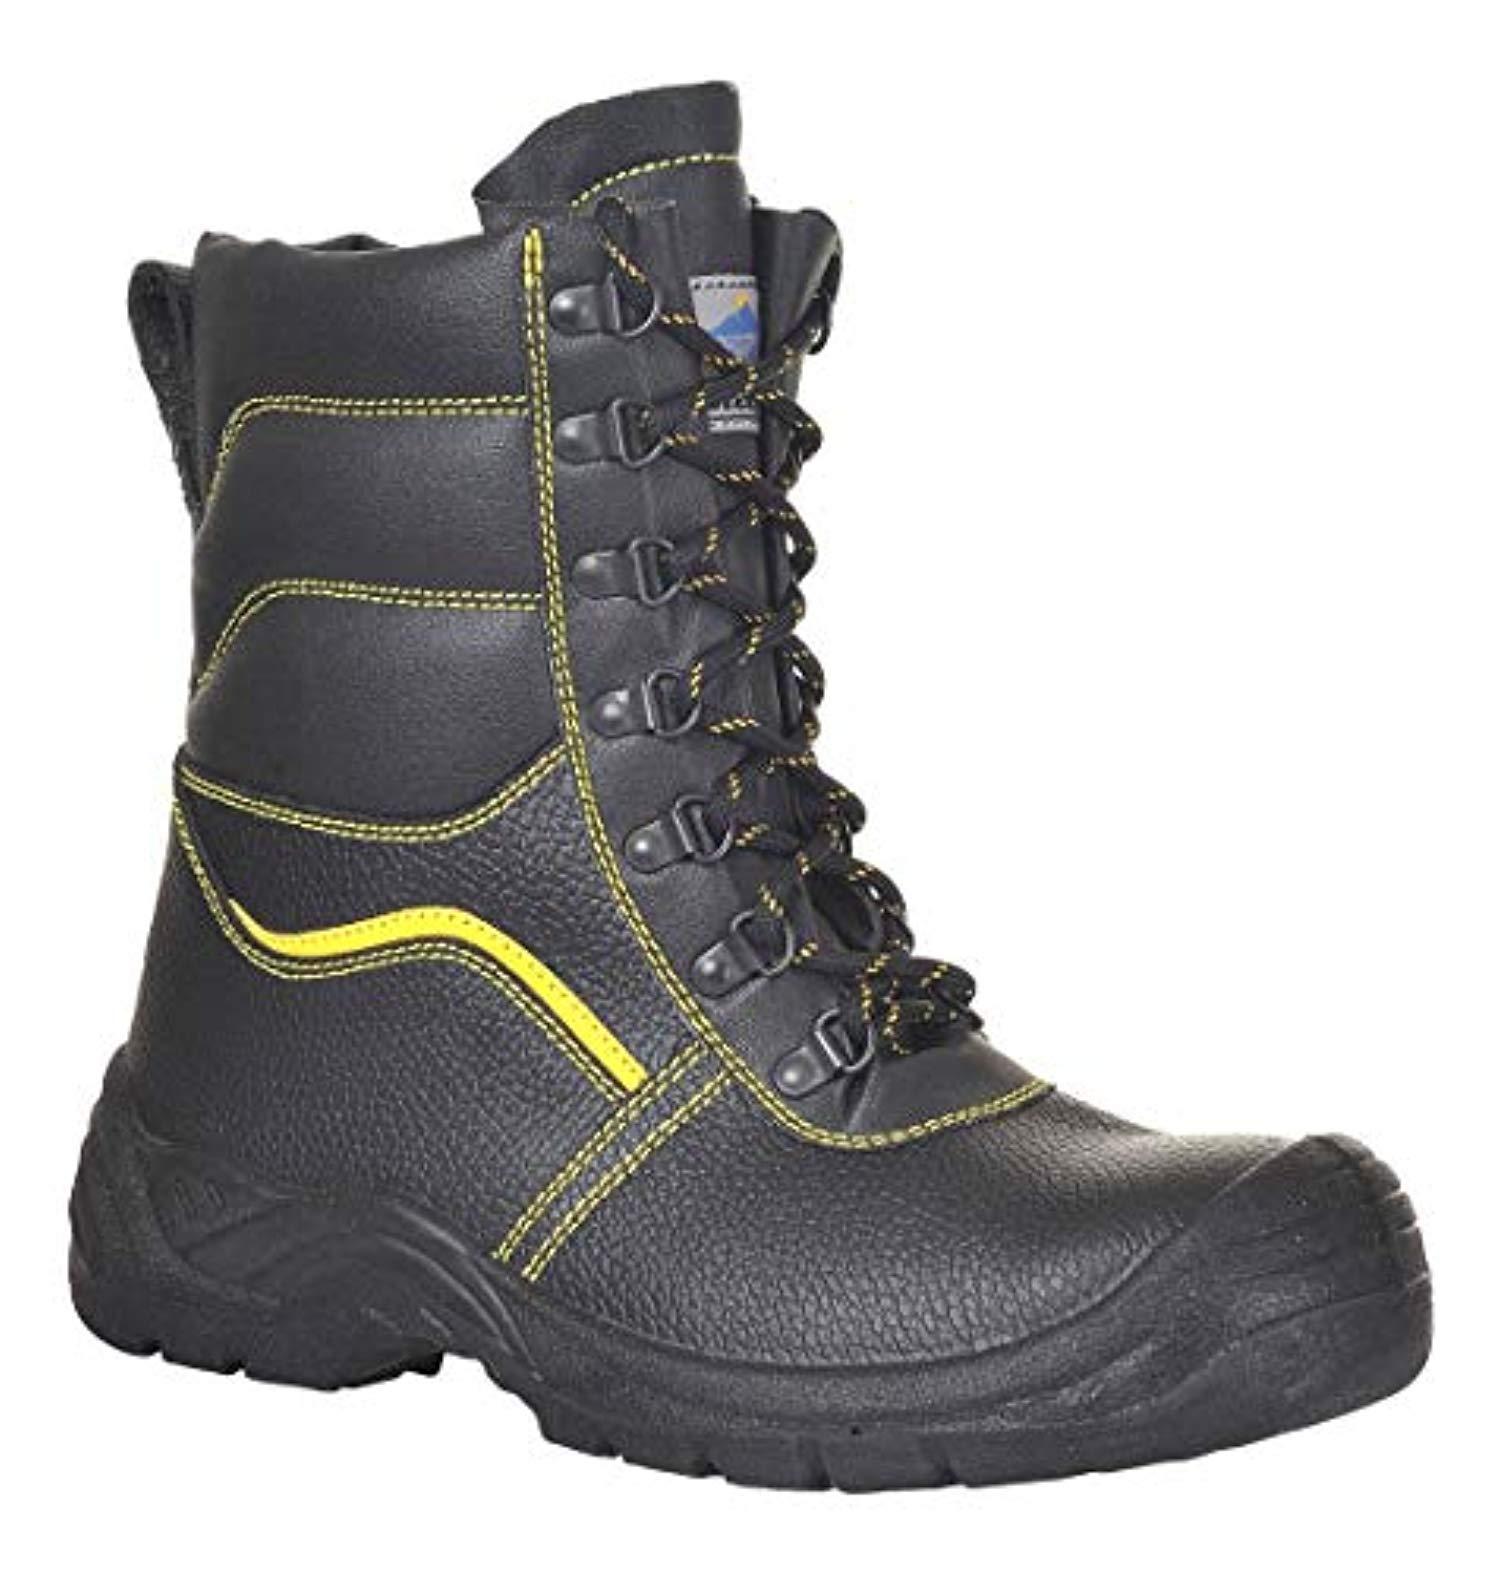 Portwest Fur Lined Protector Boot Black 11.5 R & Bandana Bundle